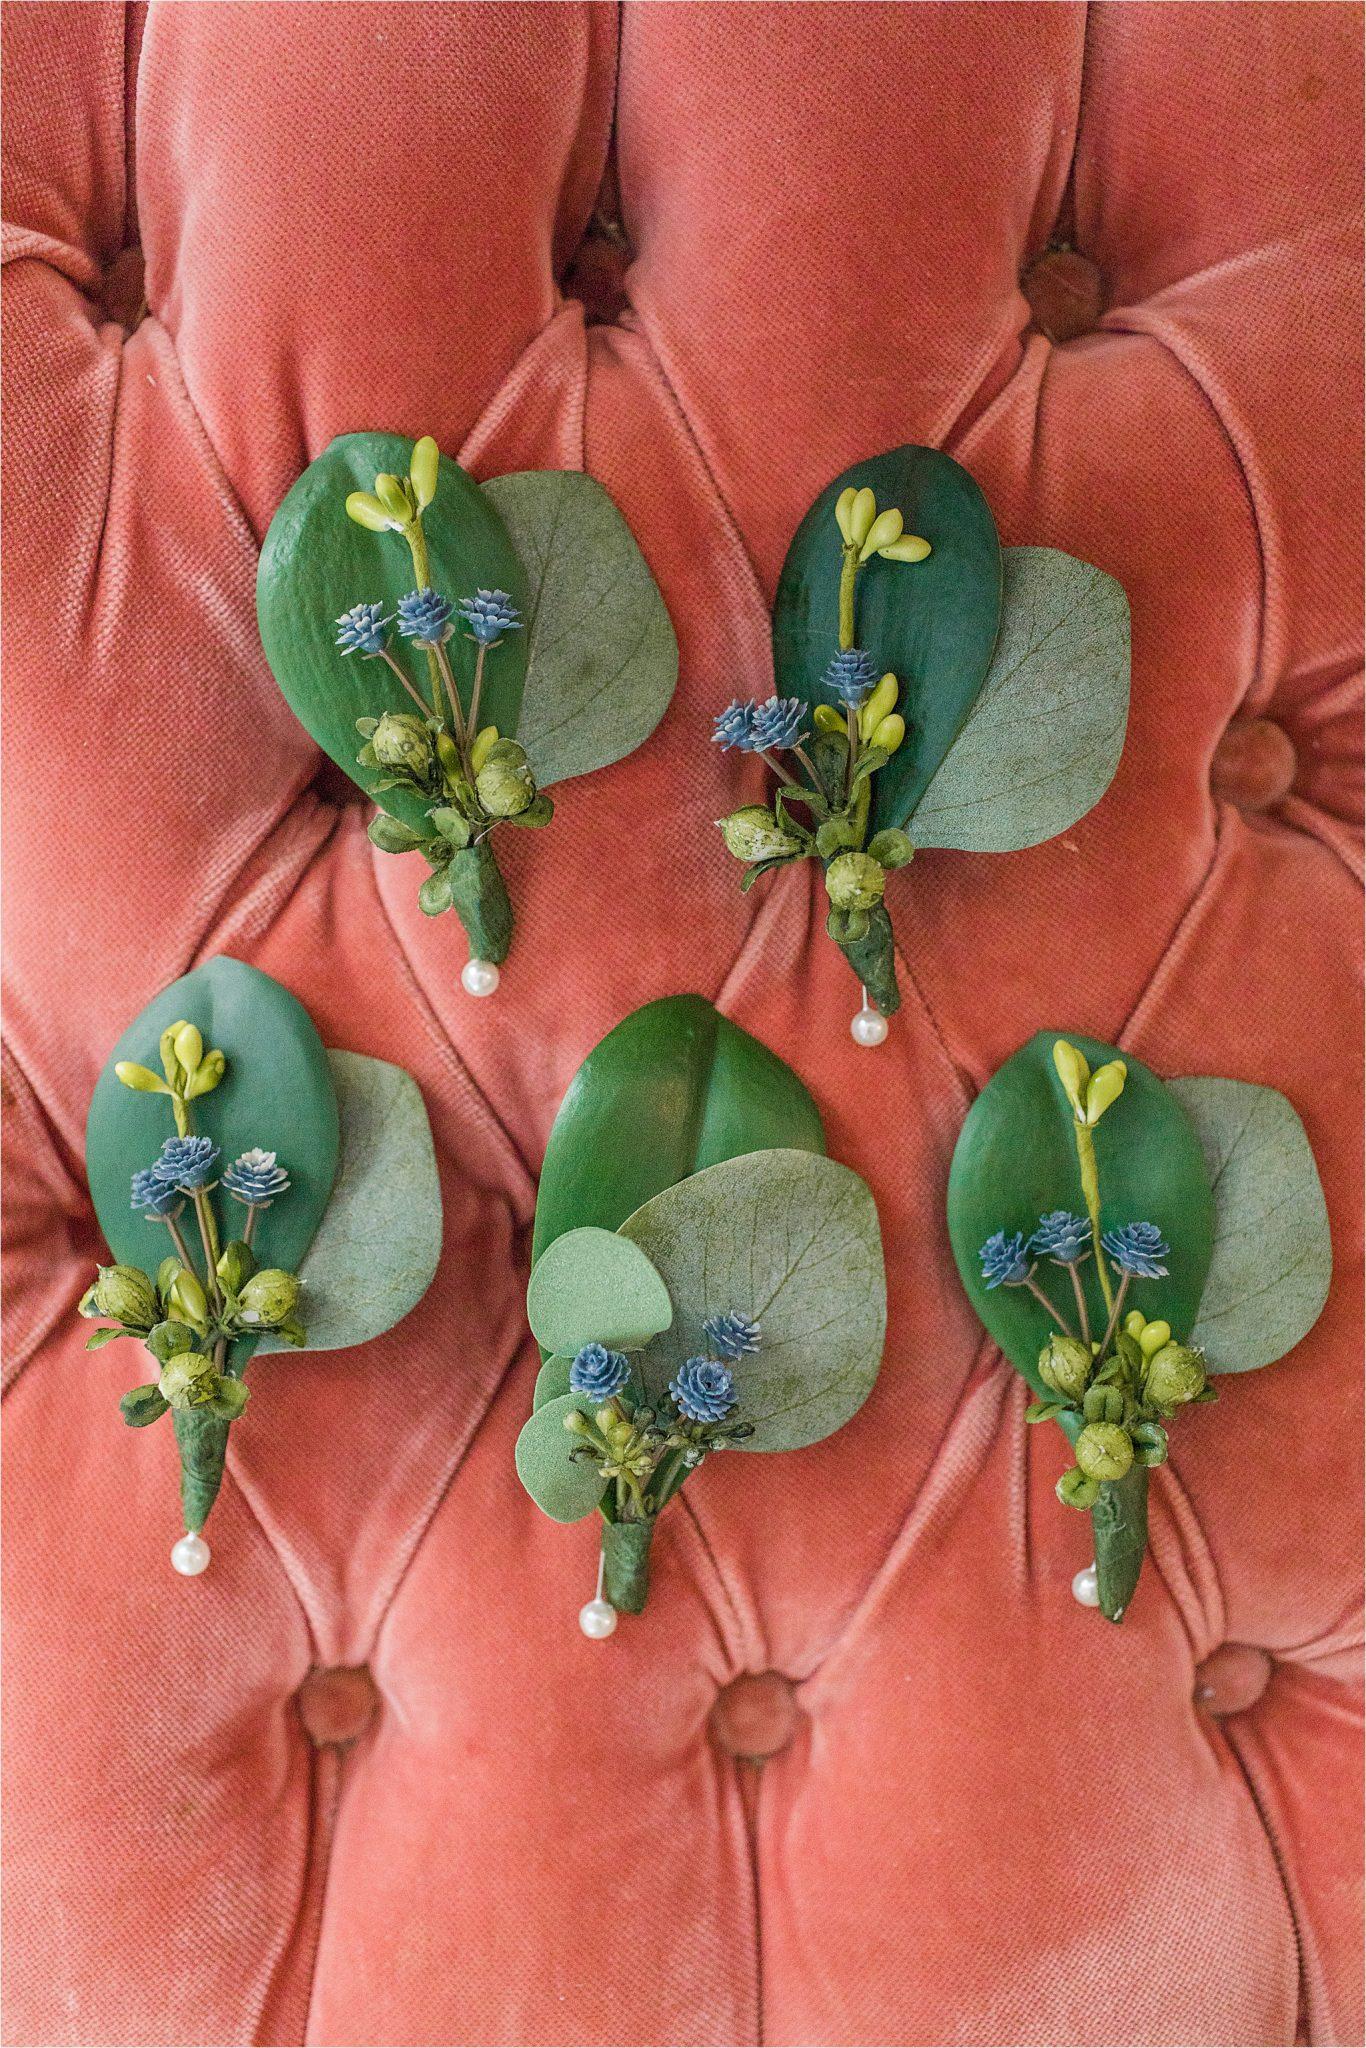 groomsmen-corsage-periwinkle-raspberry-wedding-greenery-leaves-alabama-wedding-photographer